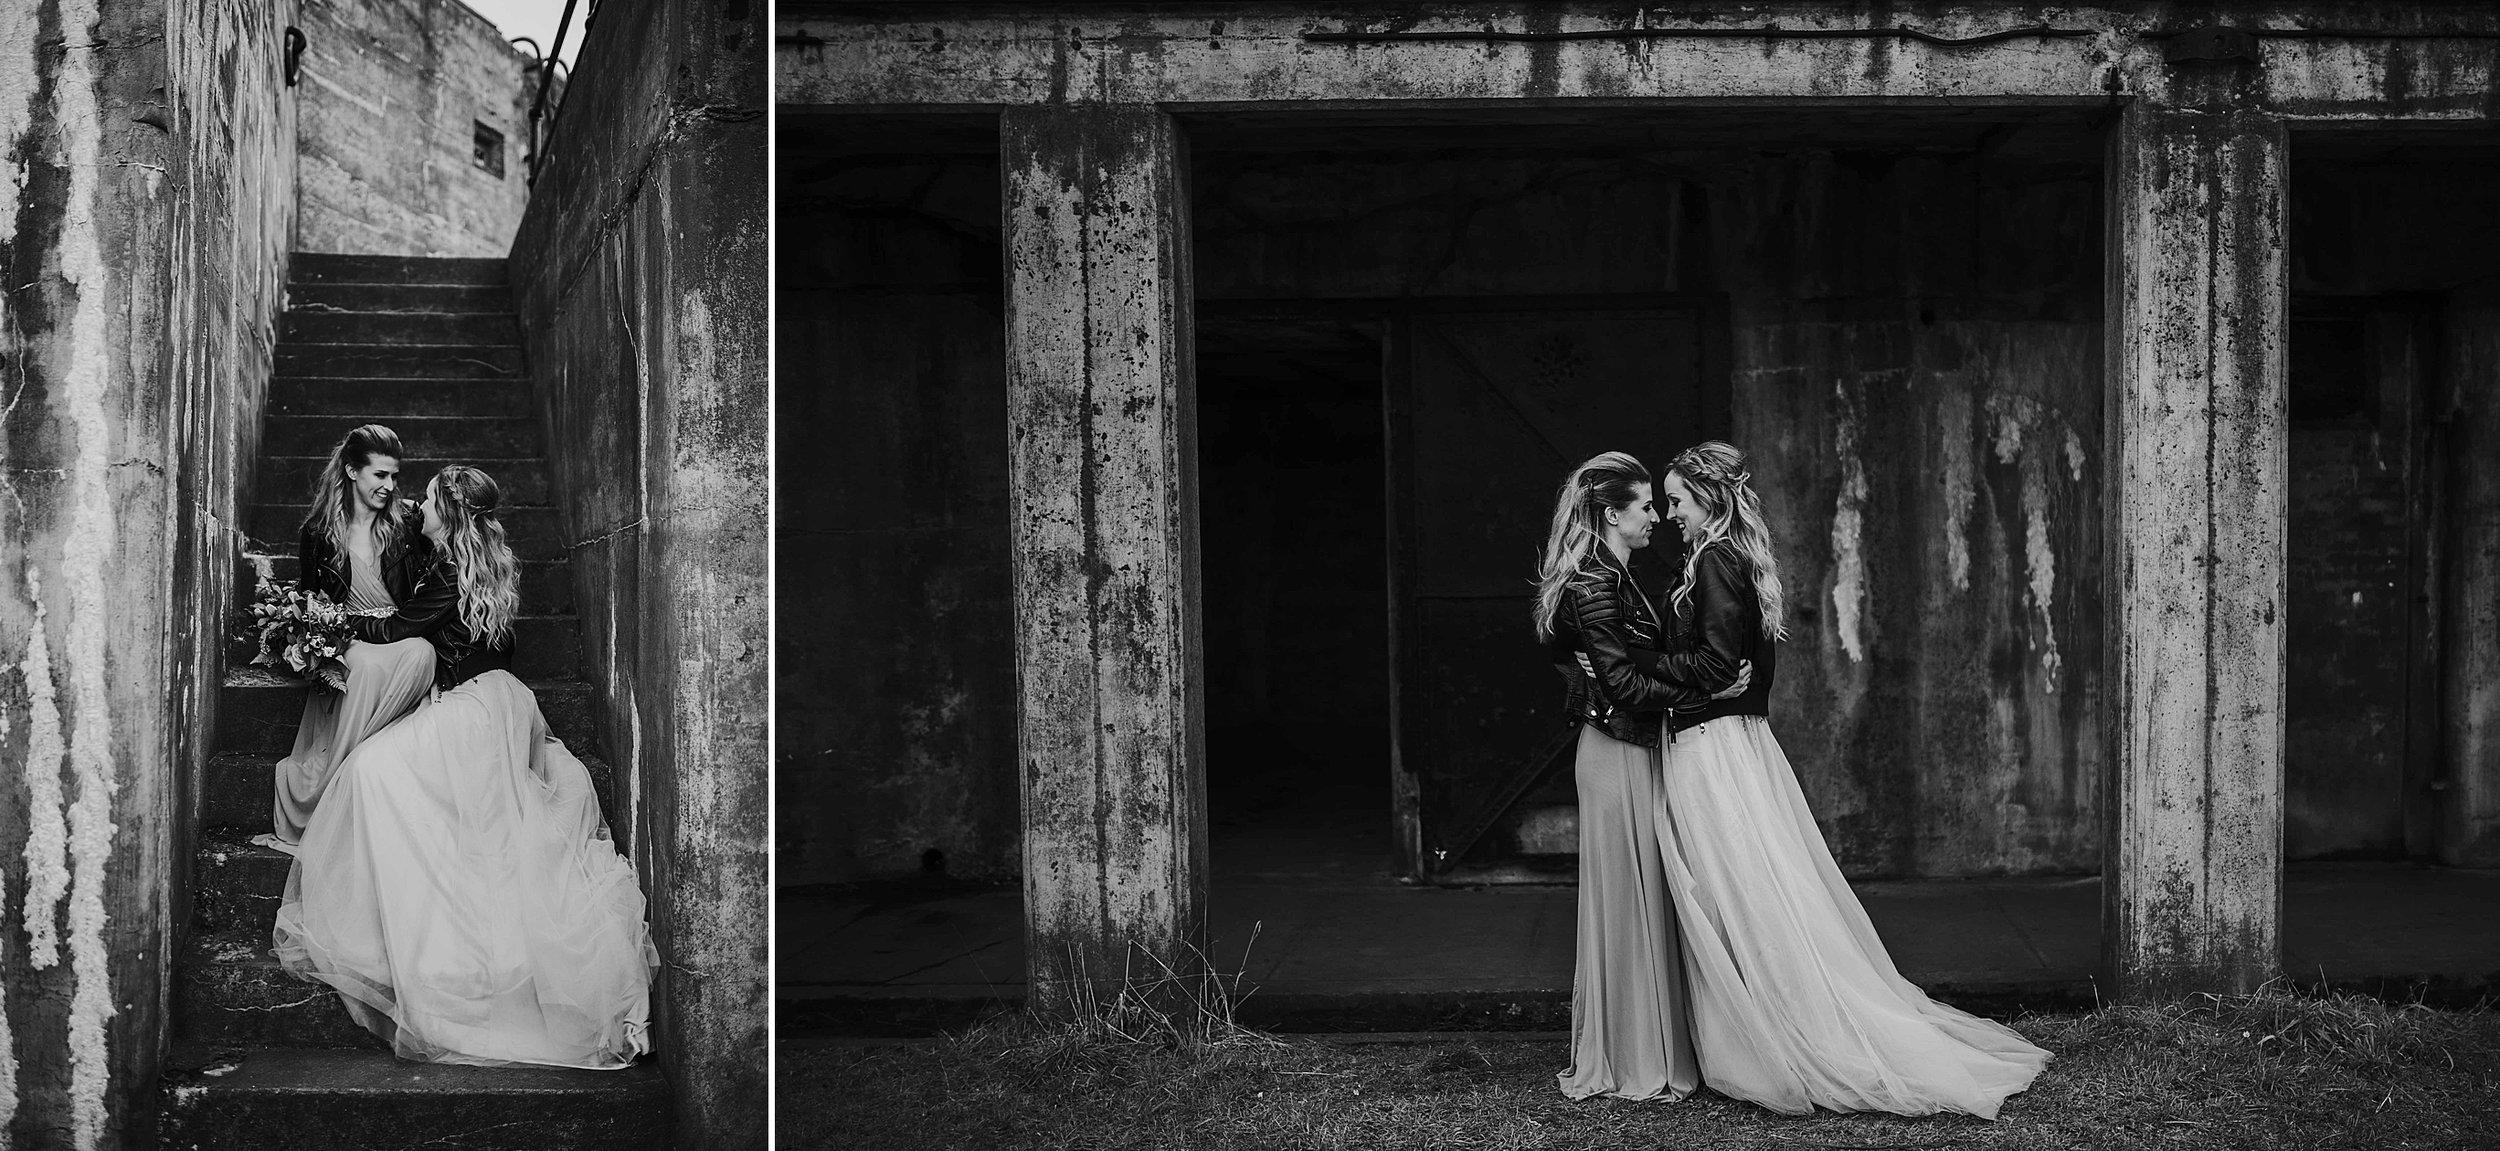 Wedding-photographer-J HODGES PHOTOGRAPHY_0242.jpg